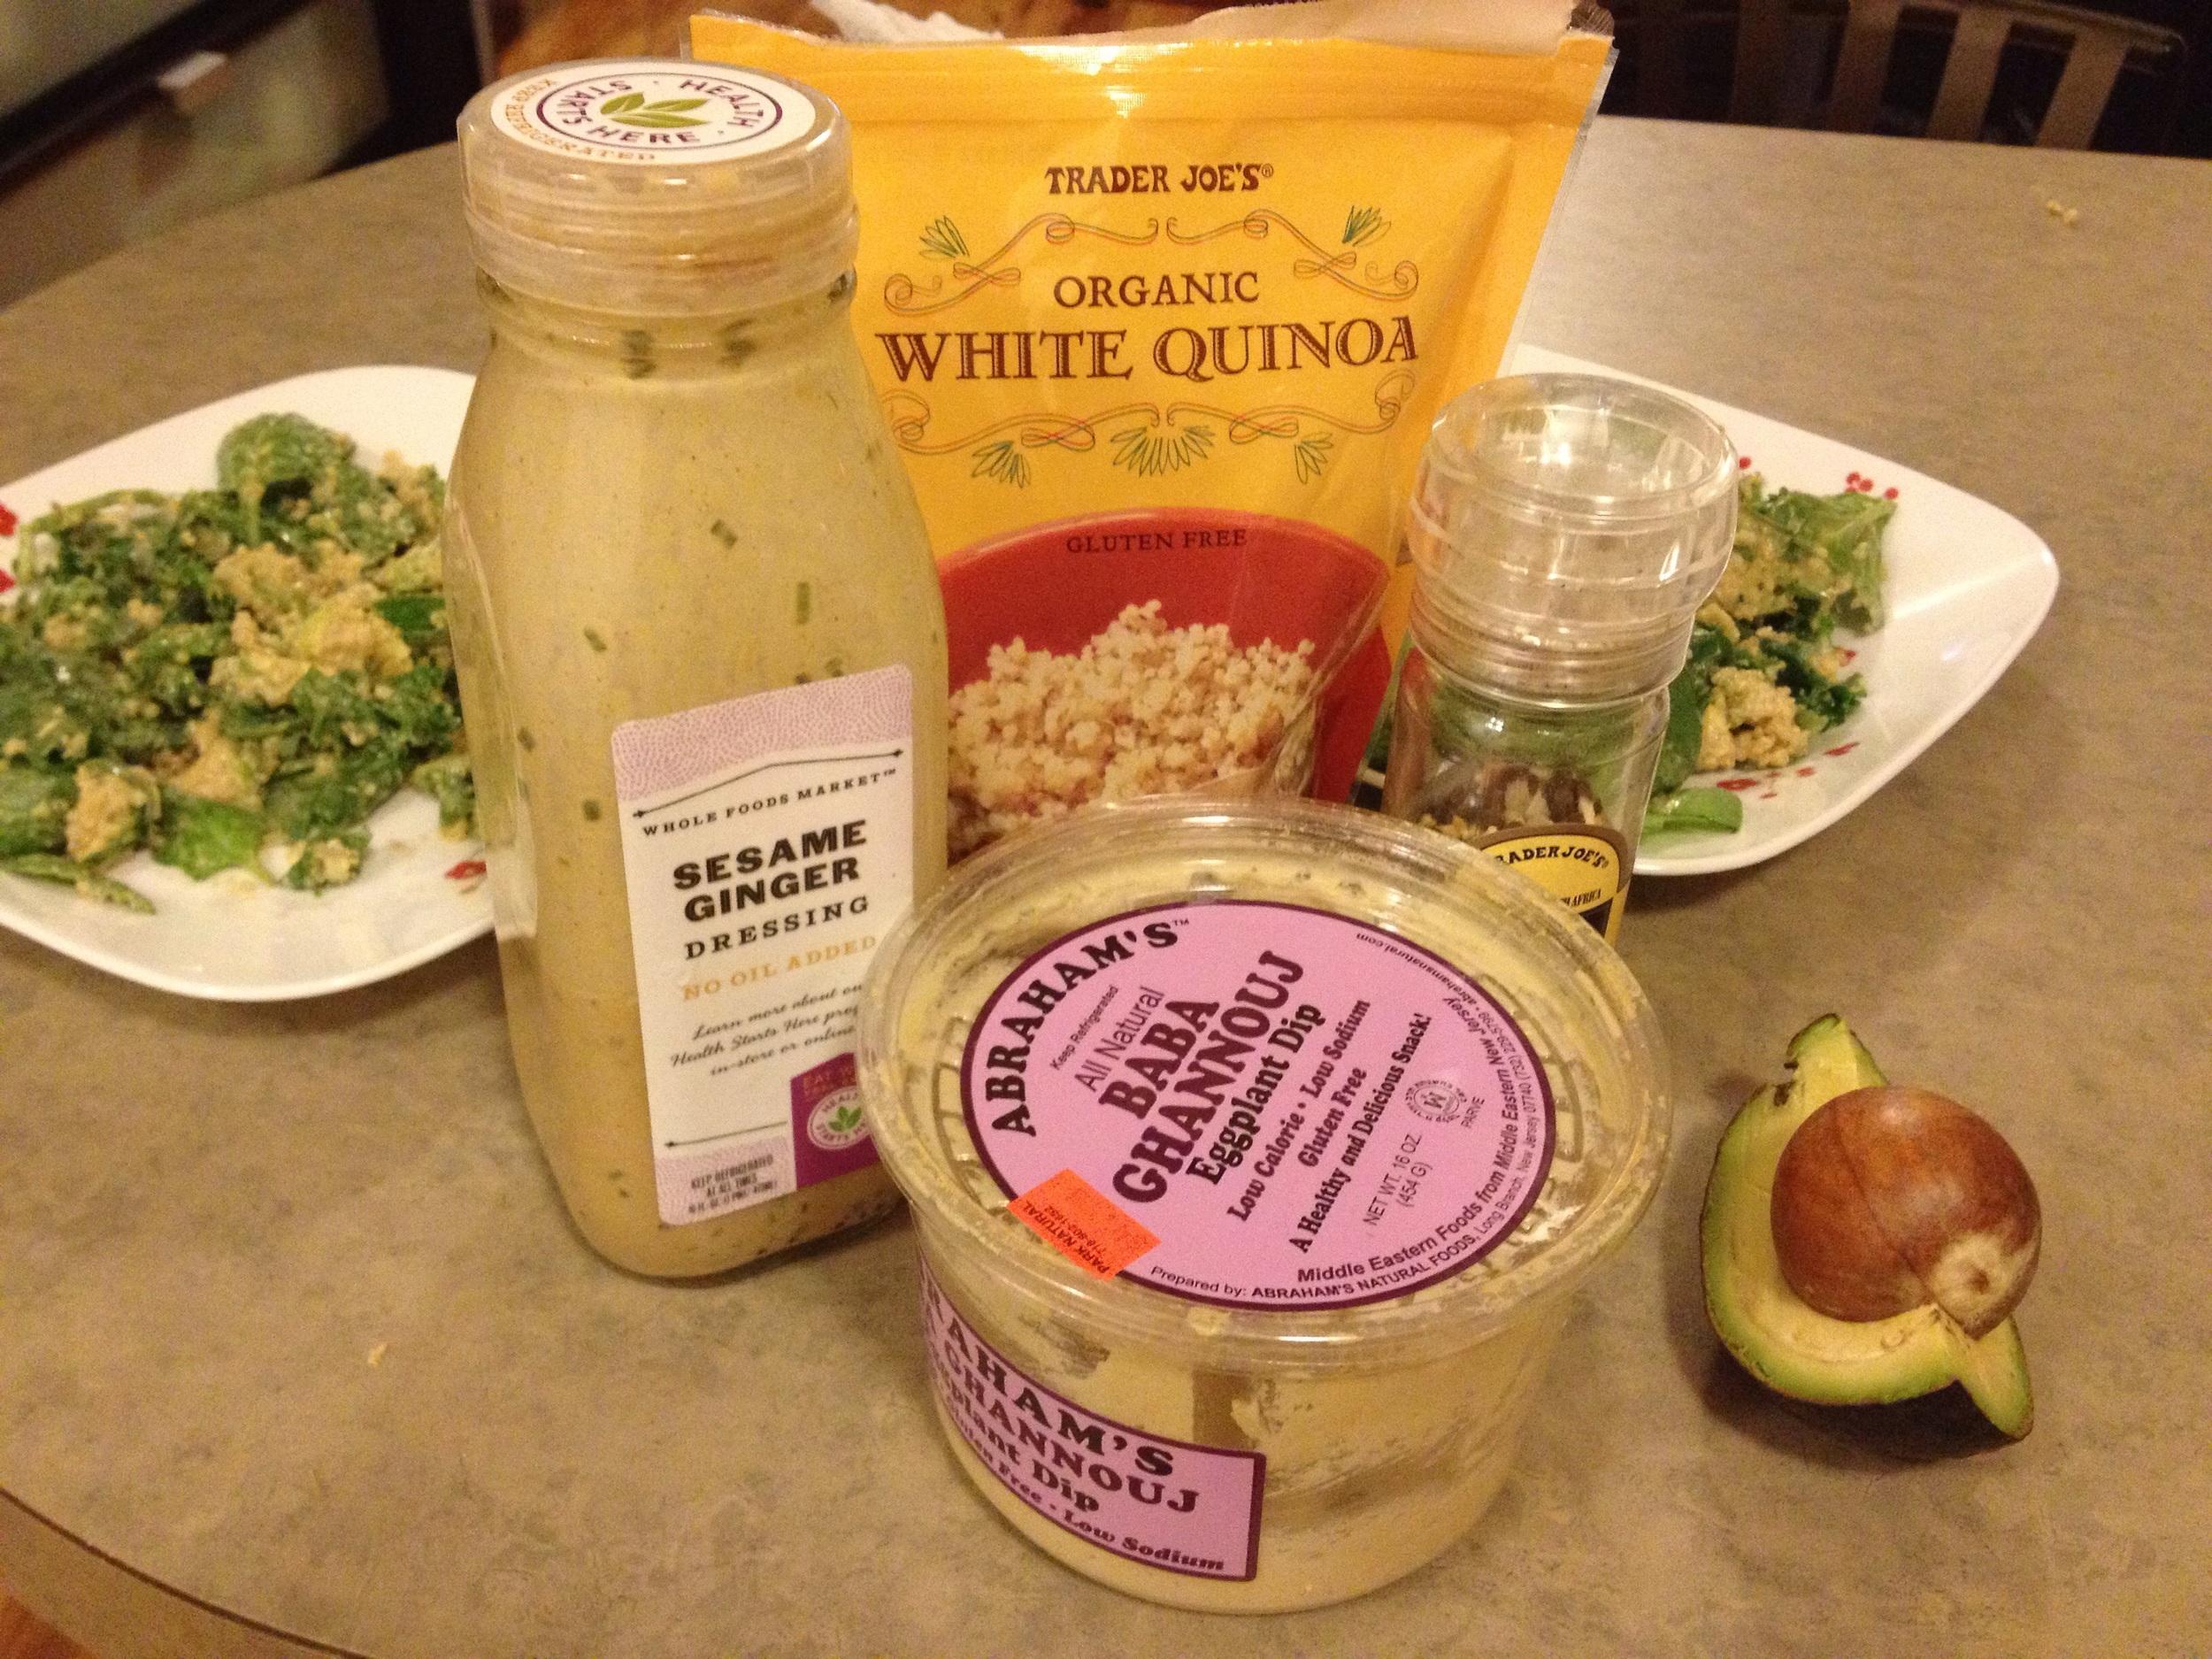 Pictured: Trader Joe's Organic White Quinoa,Cindy Kitchen's for Whole Food's Sesame Ginger Dressing, Abraham's All Natural Baba Ghannouj, Trader Joe's Lemon Pepper Seasoning